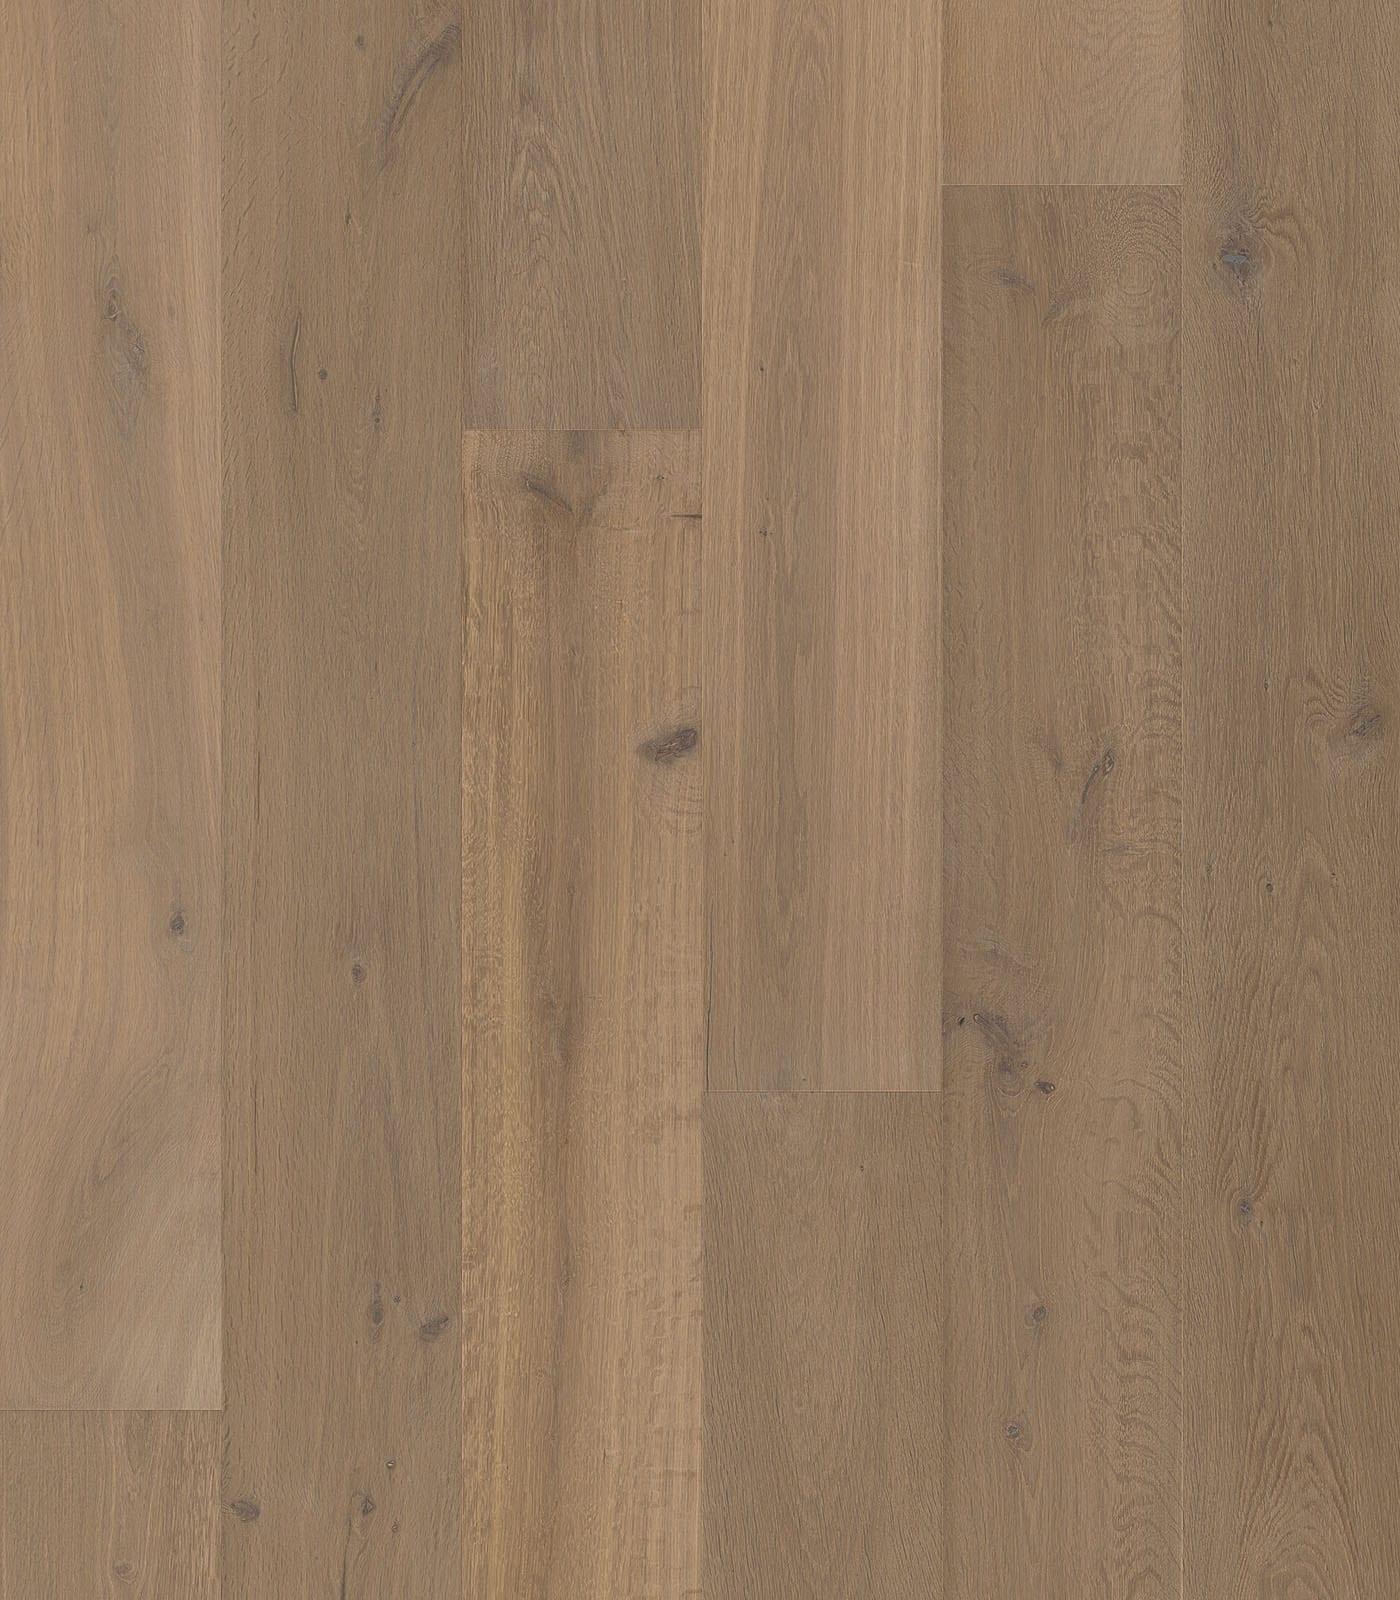 Majorca-Lifestyle Collection-European Oak Floors-flat